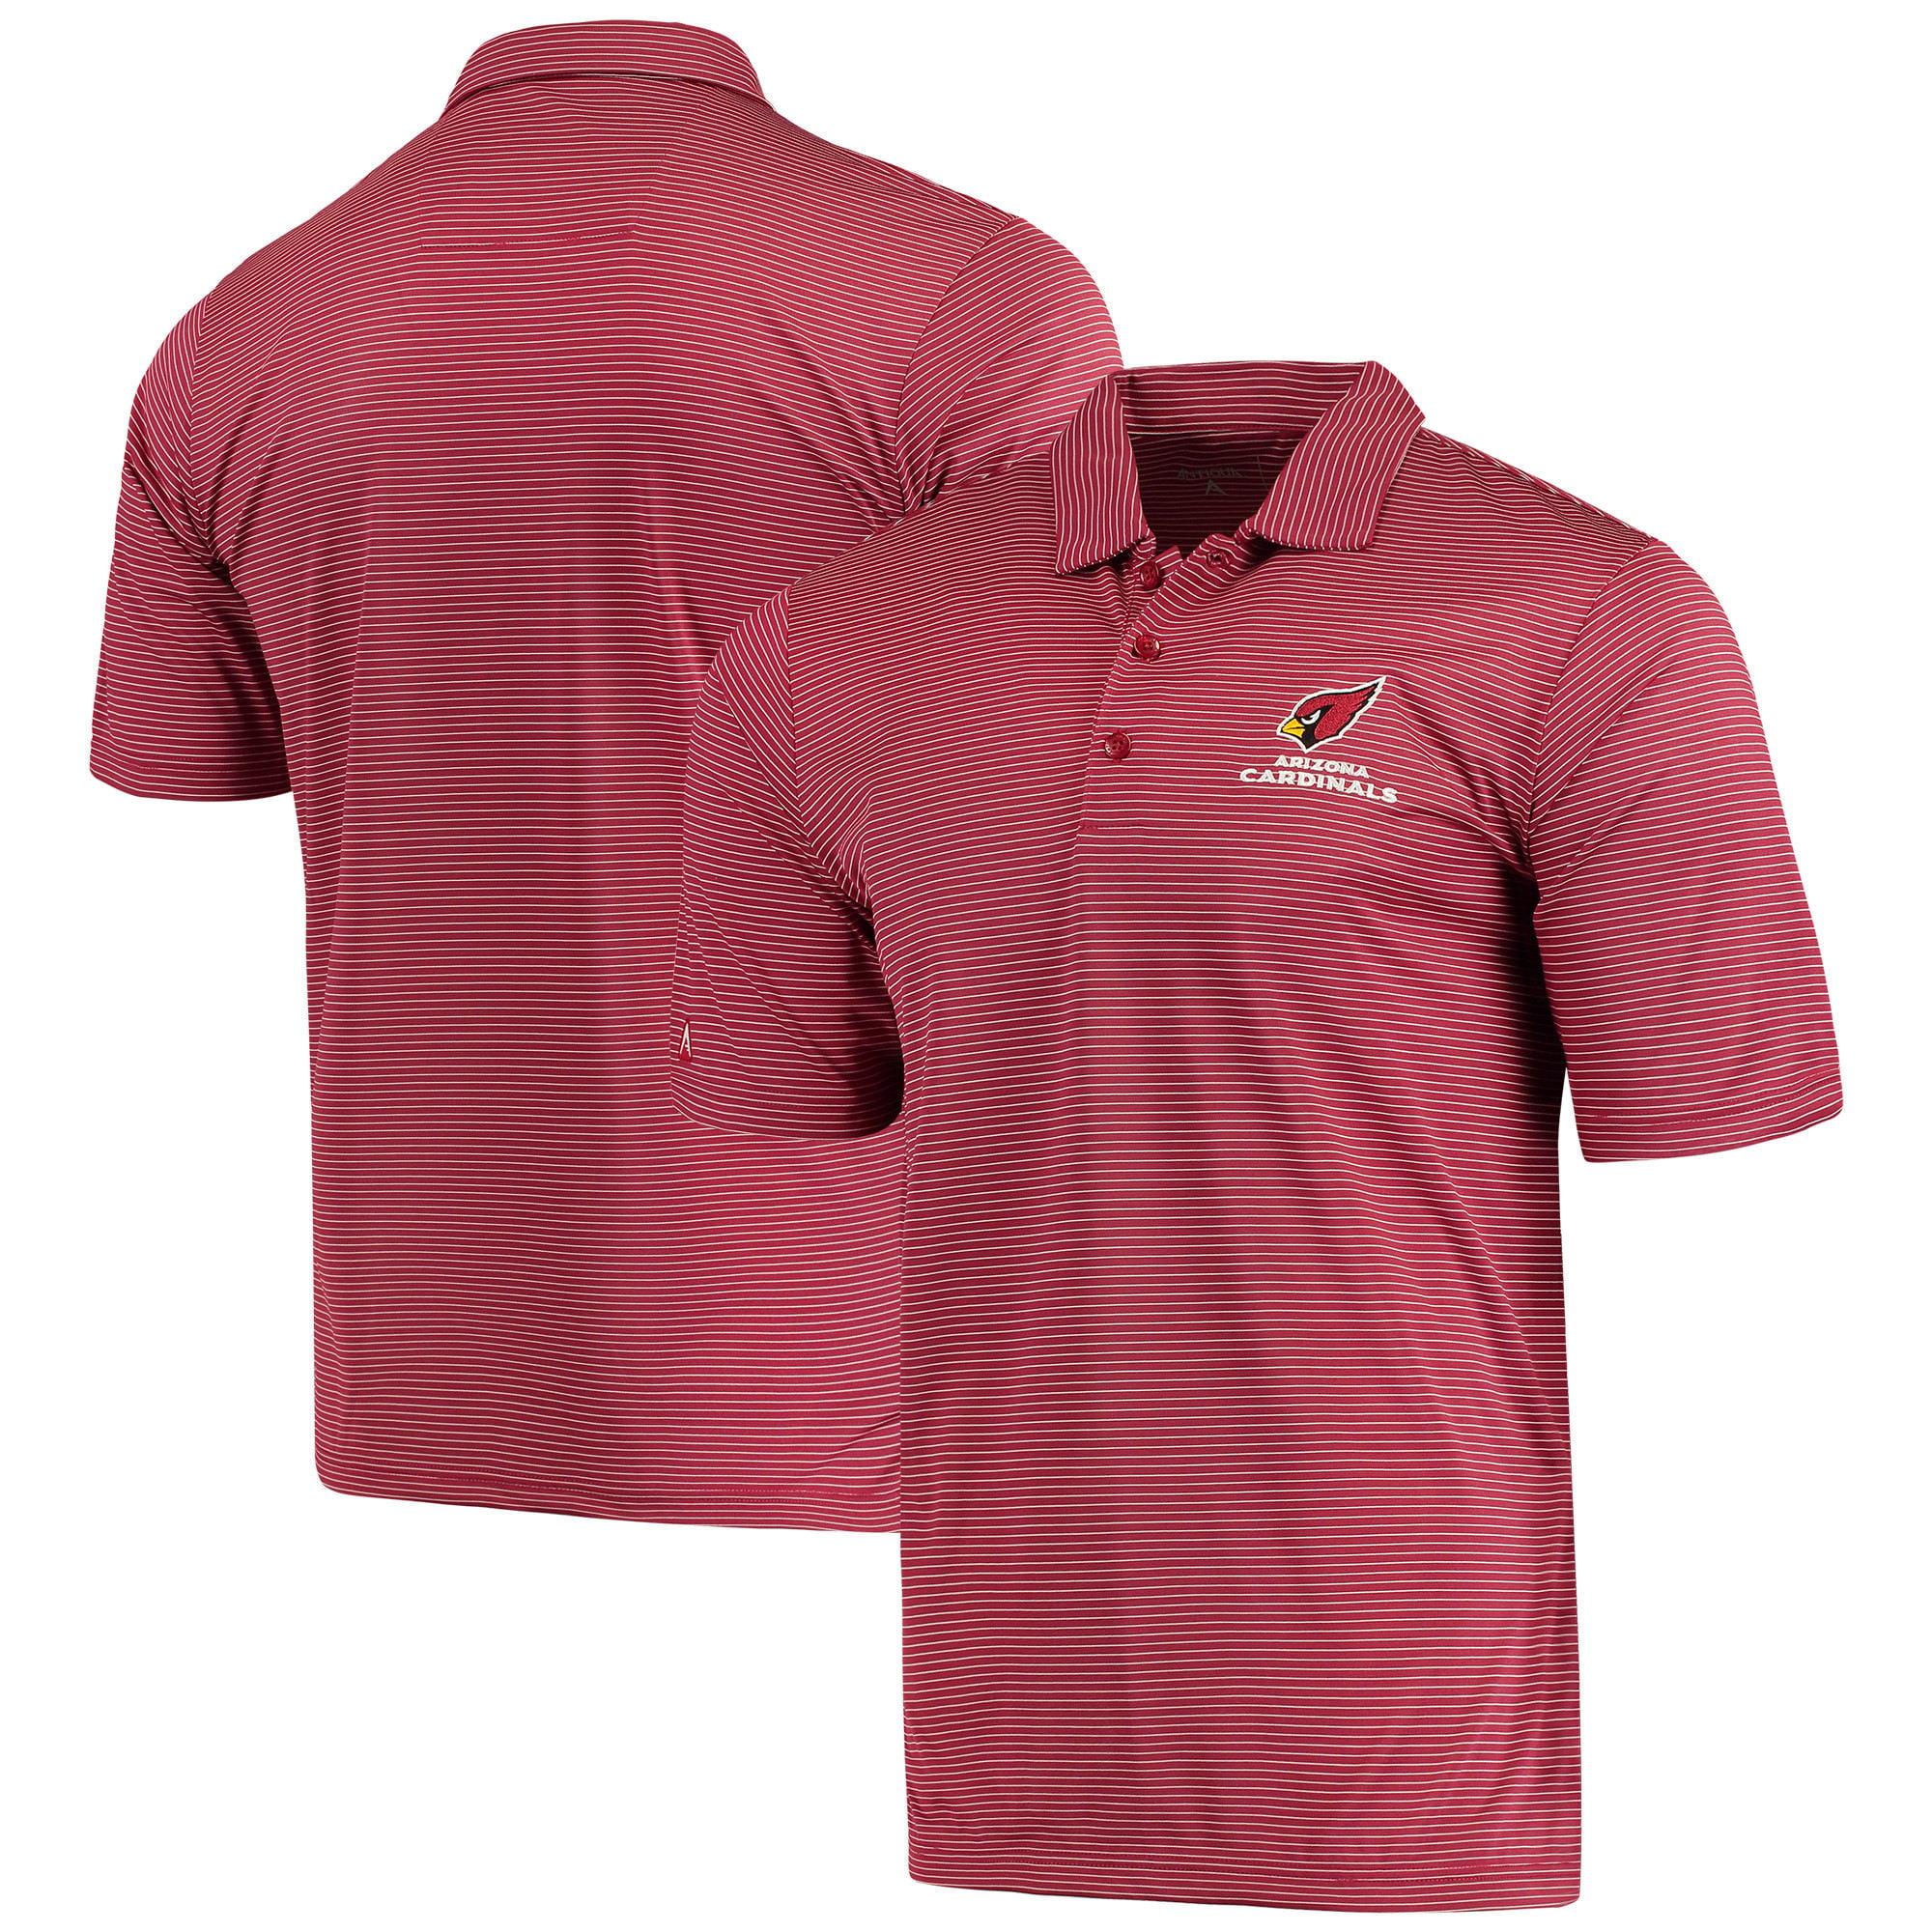 Arizona Cardinals Antigua Quest Polo - Cardinal/White